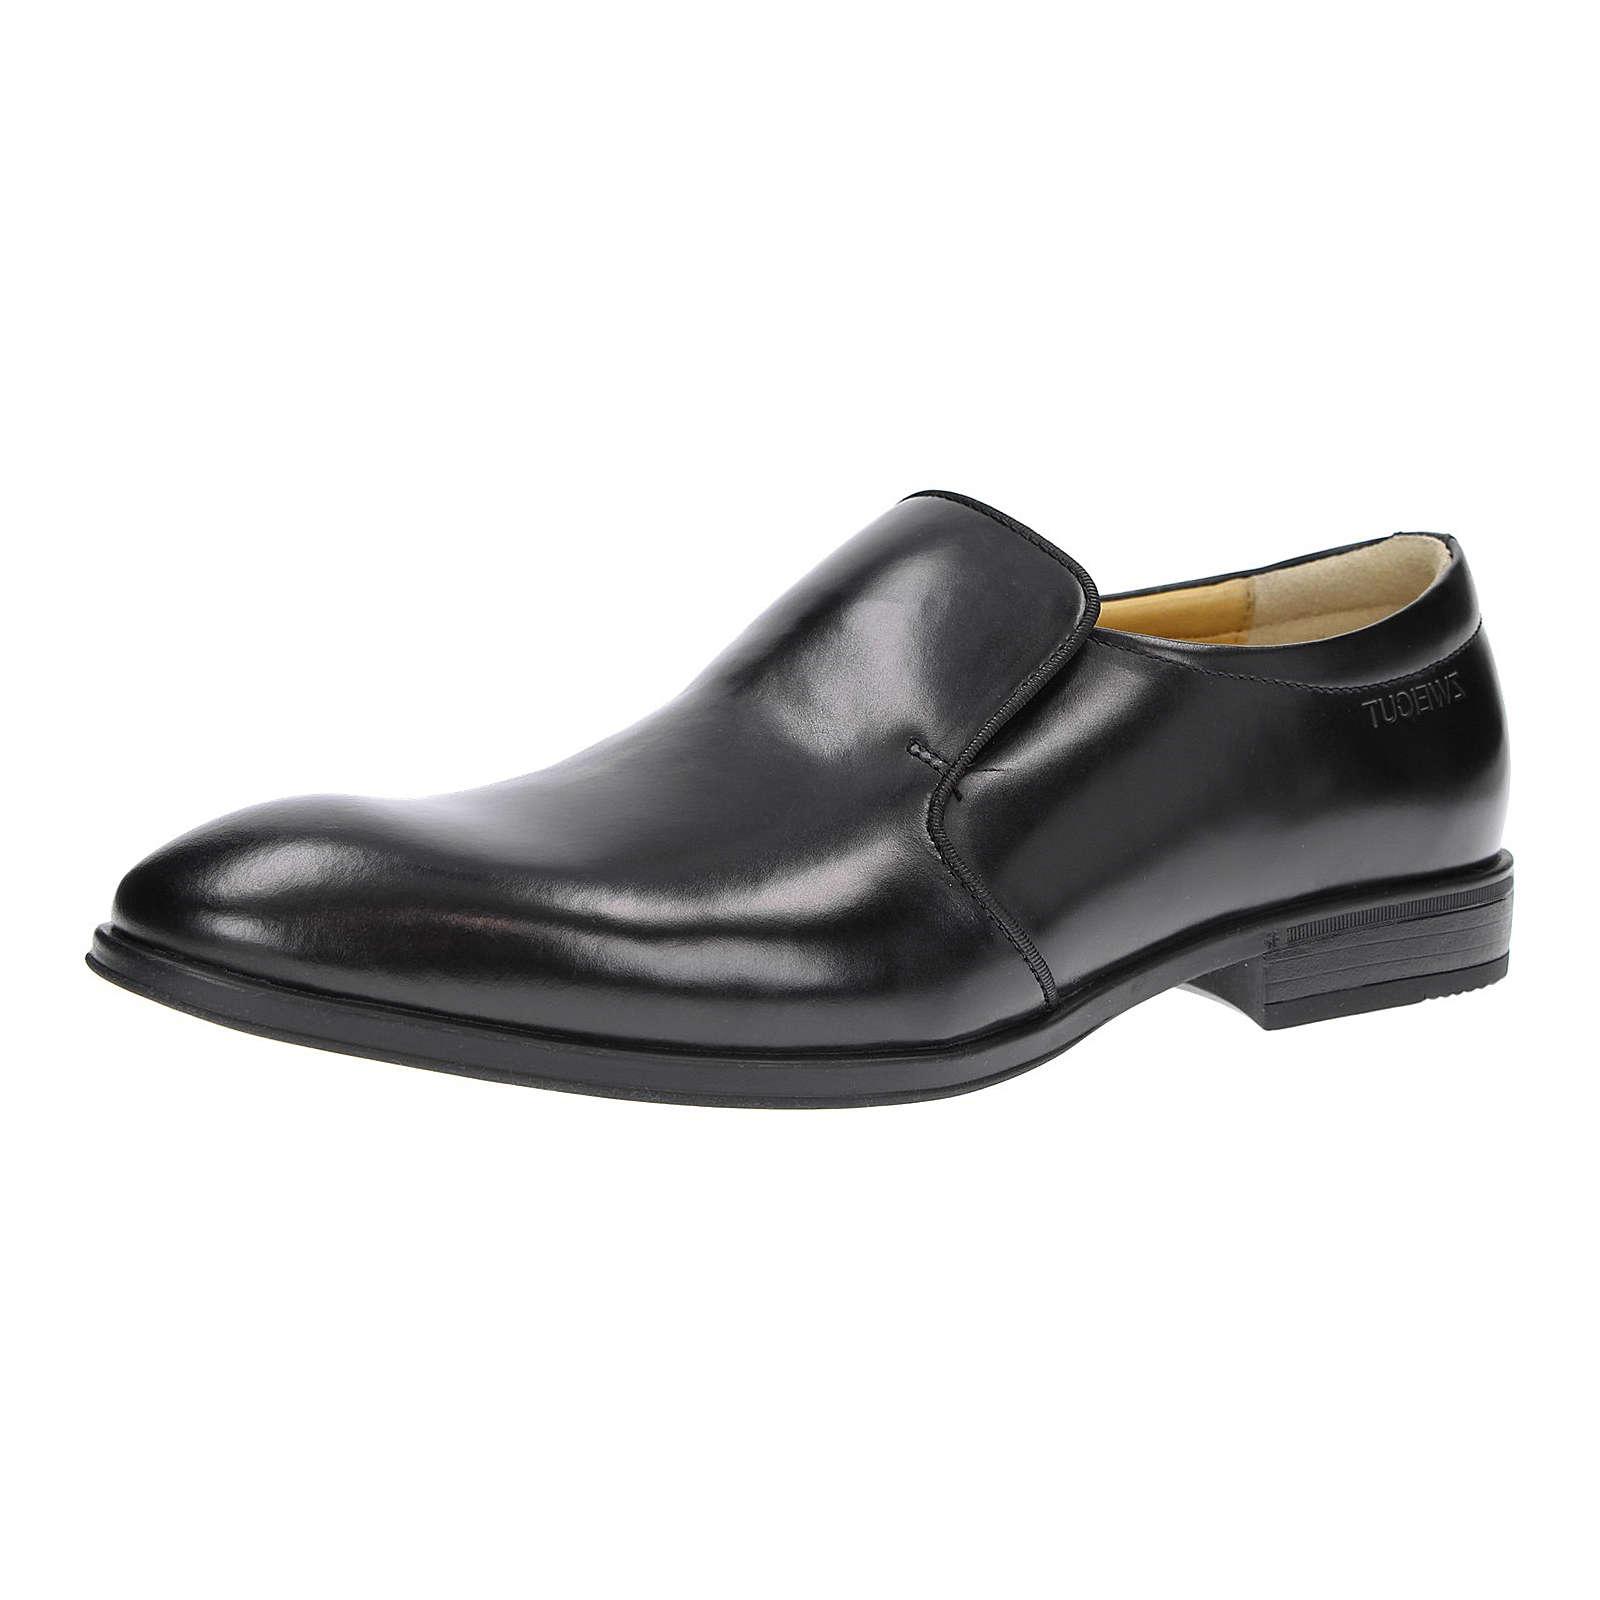 ZWEIGUT® Business Komfort-König smuck #274 Herren Leder Slip-On Loafer schwarz Herren Gr. 42